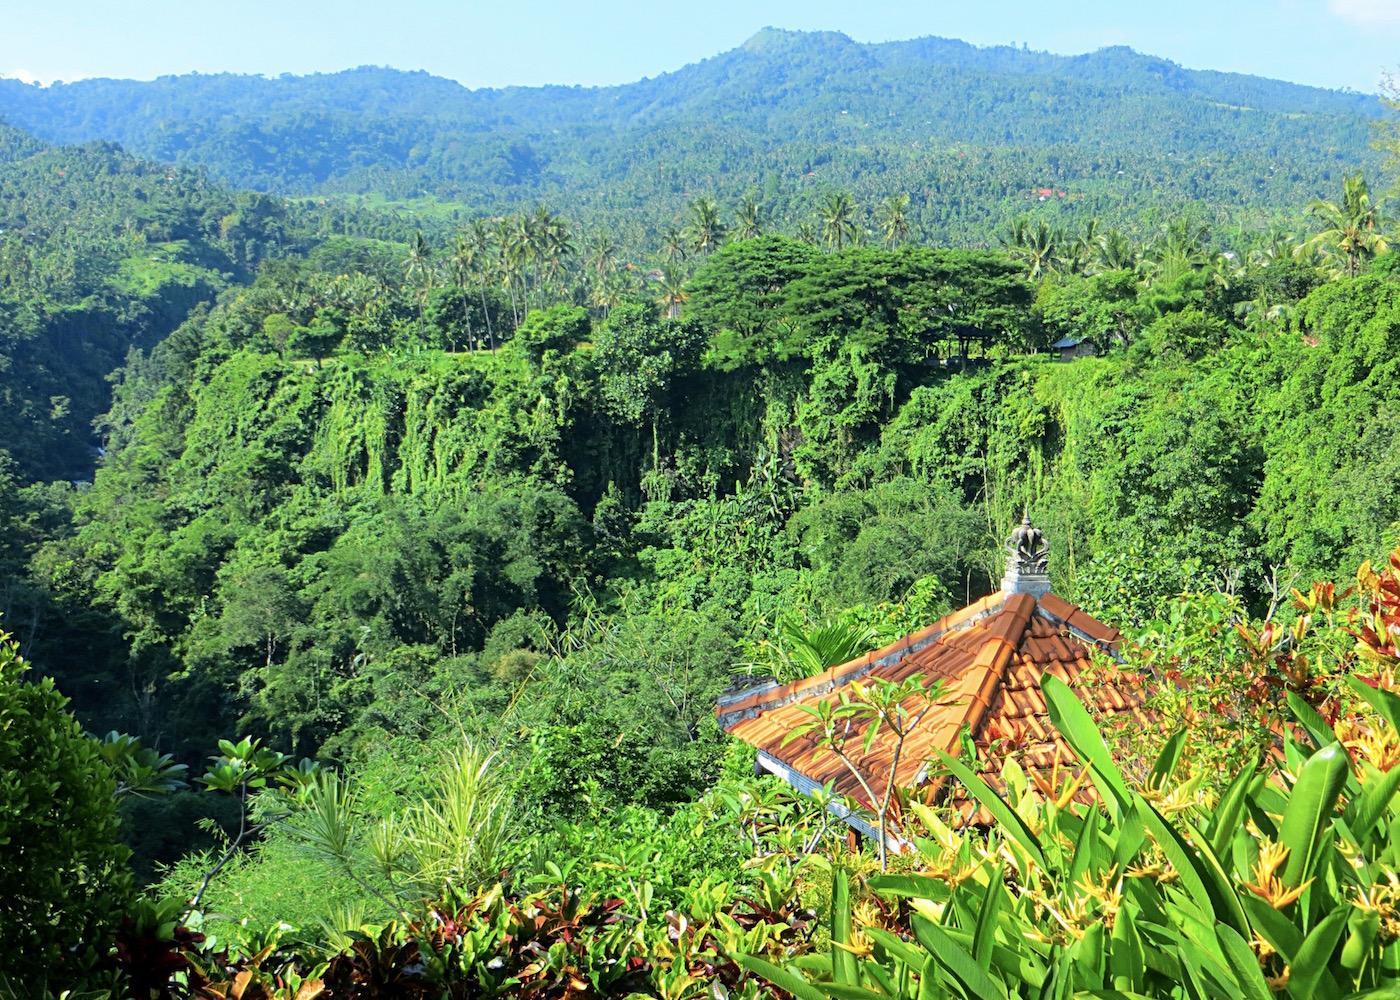 Hiking in Pemuteran, North Bali, Indonesia